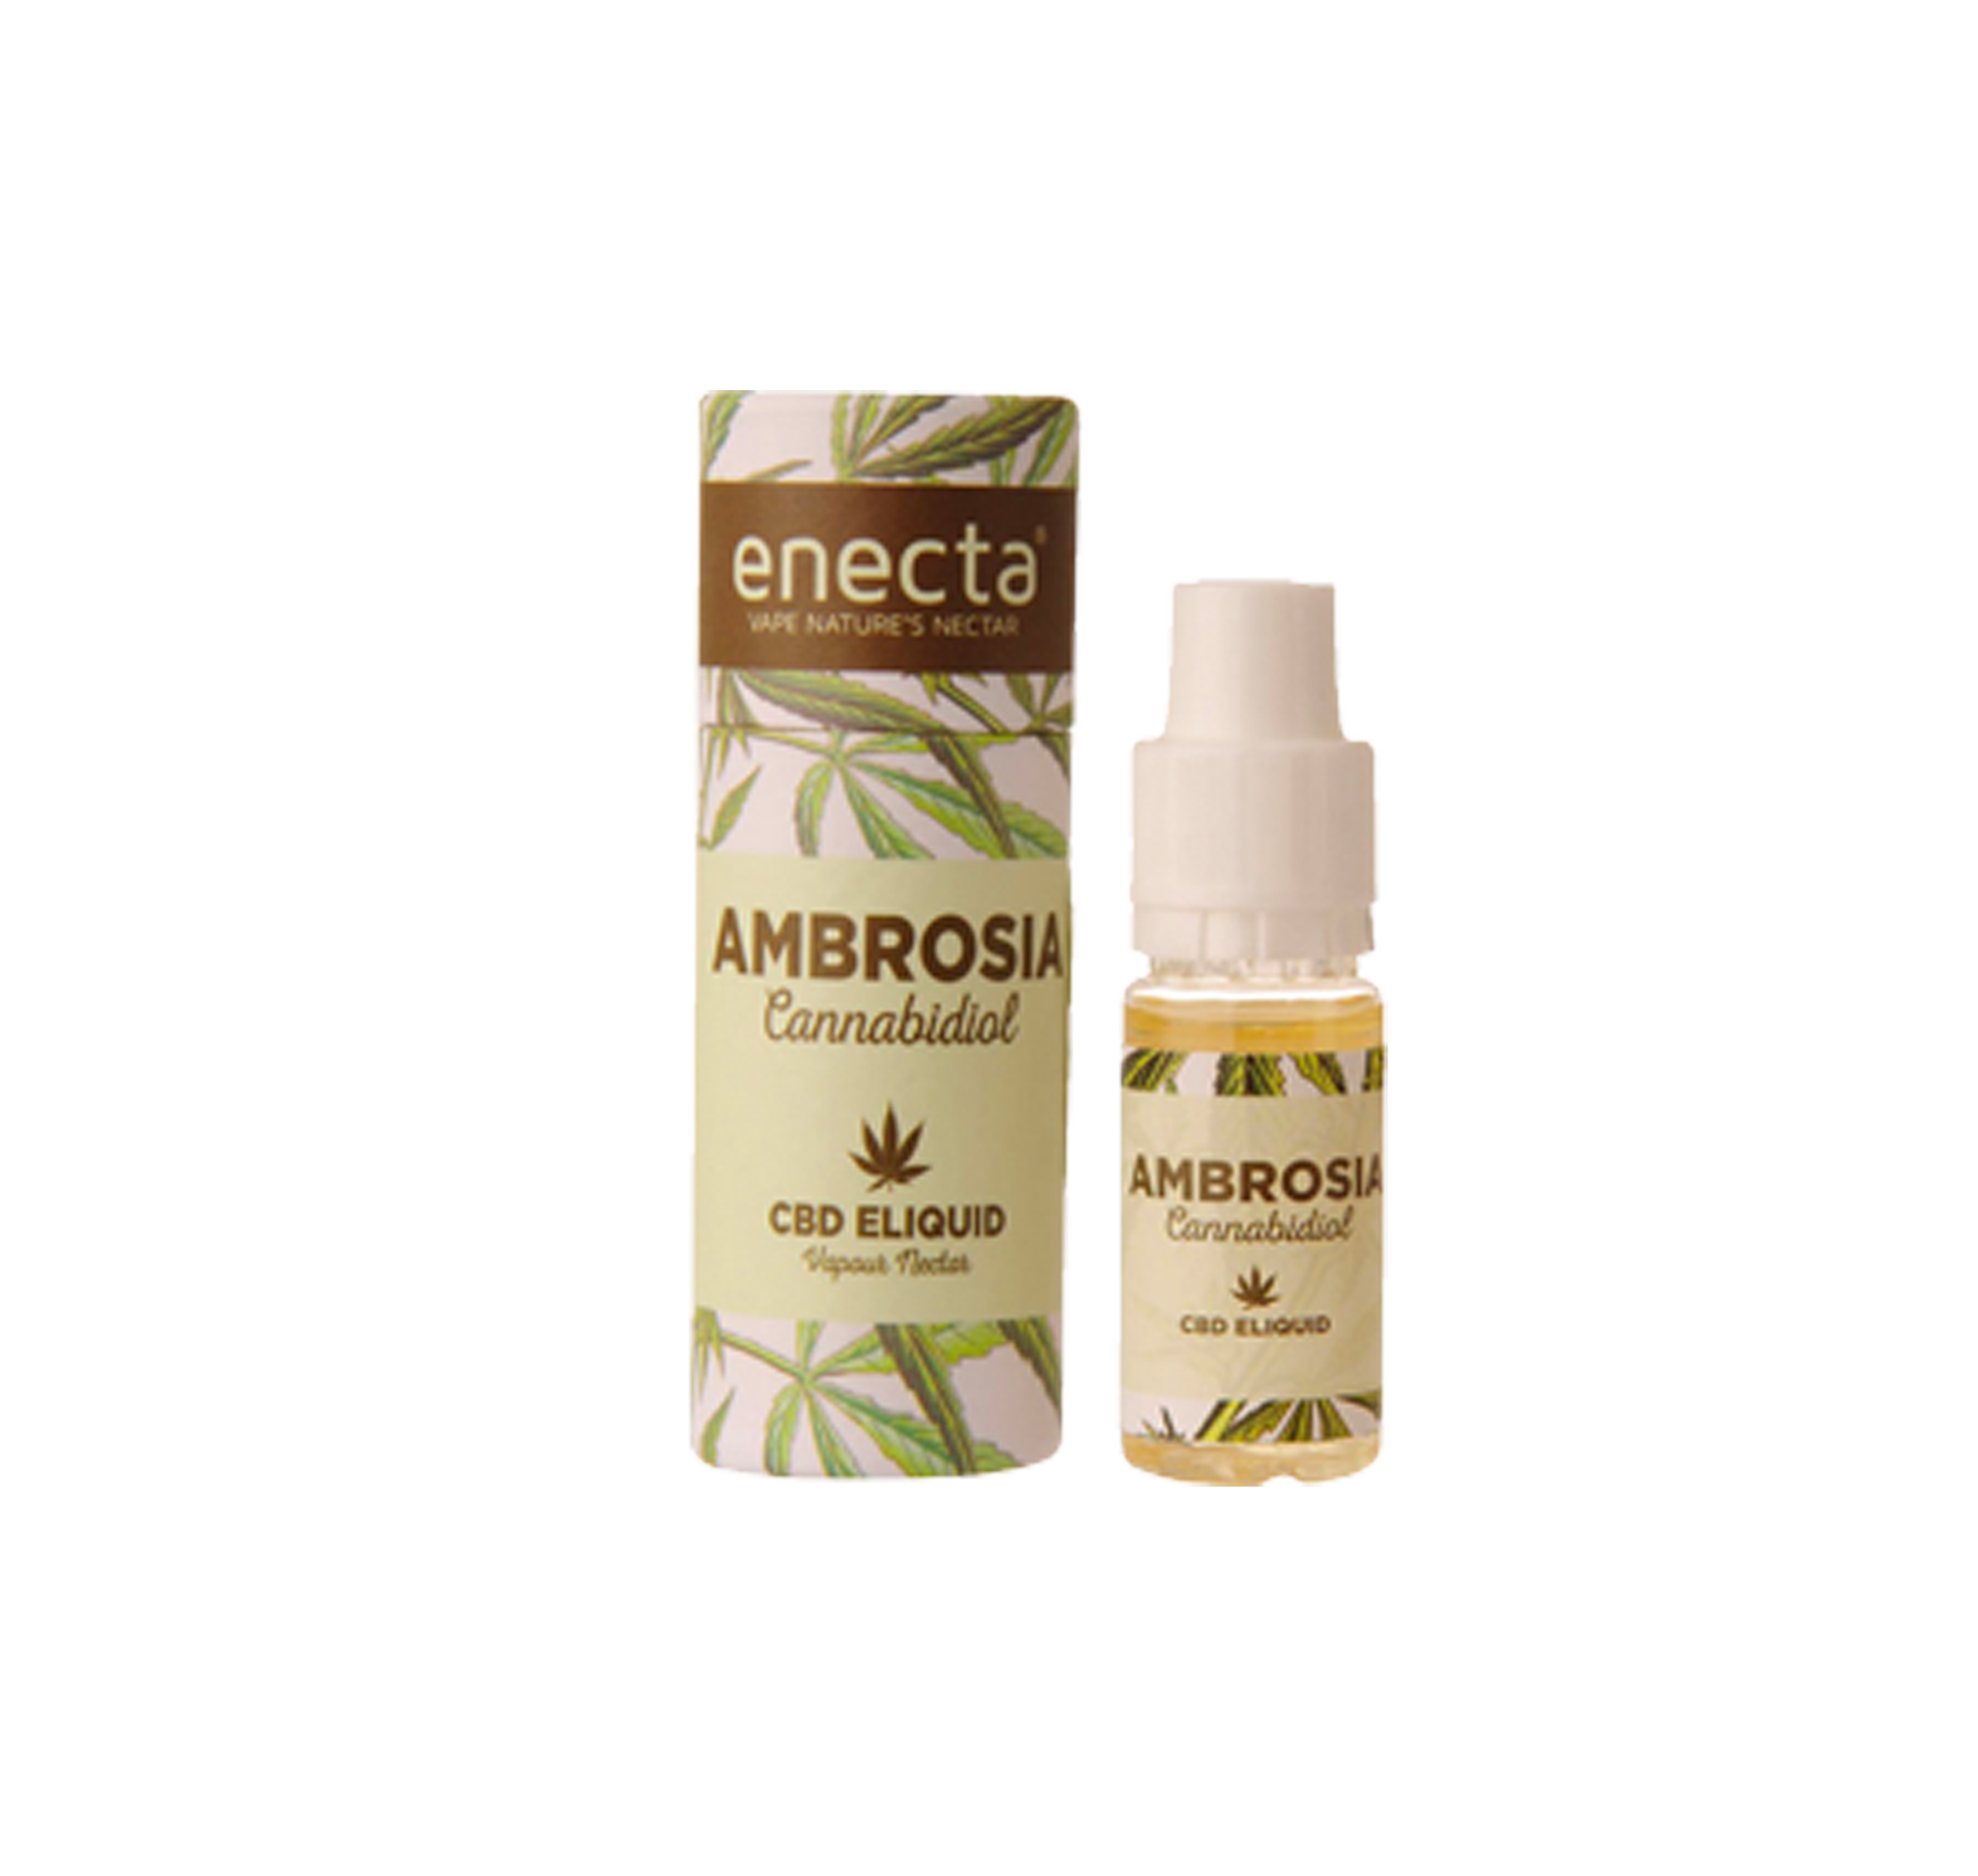 CBD-Liquid Ambrosia Tabacco | 10 ml mit 20 mg CBD